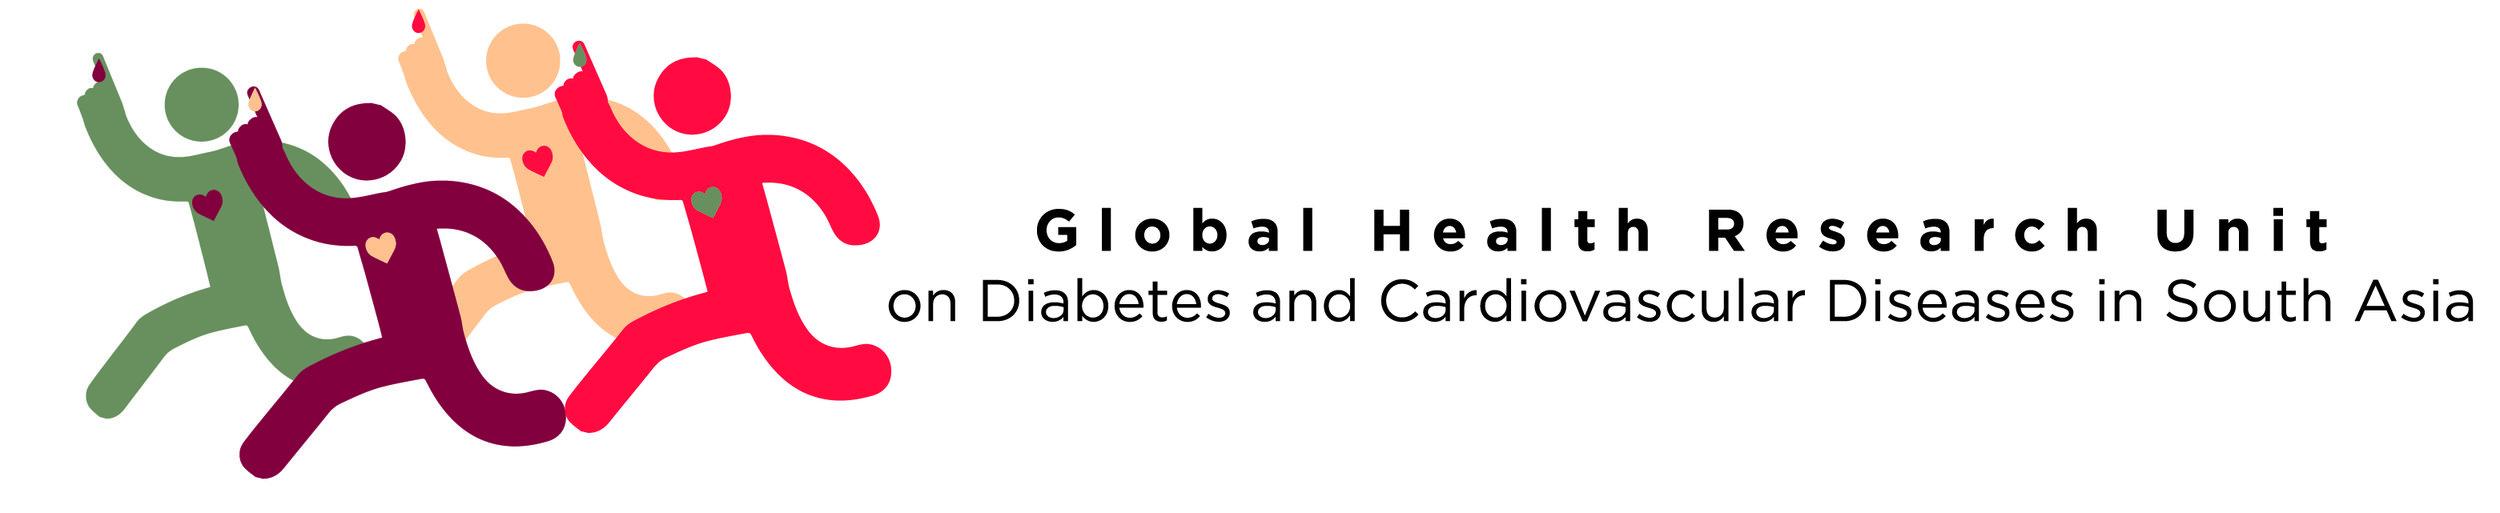 ImperialCollege_GlobalHealthResearchUnit_Logo4 (1).jpg